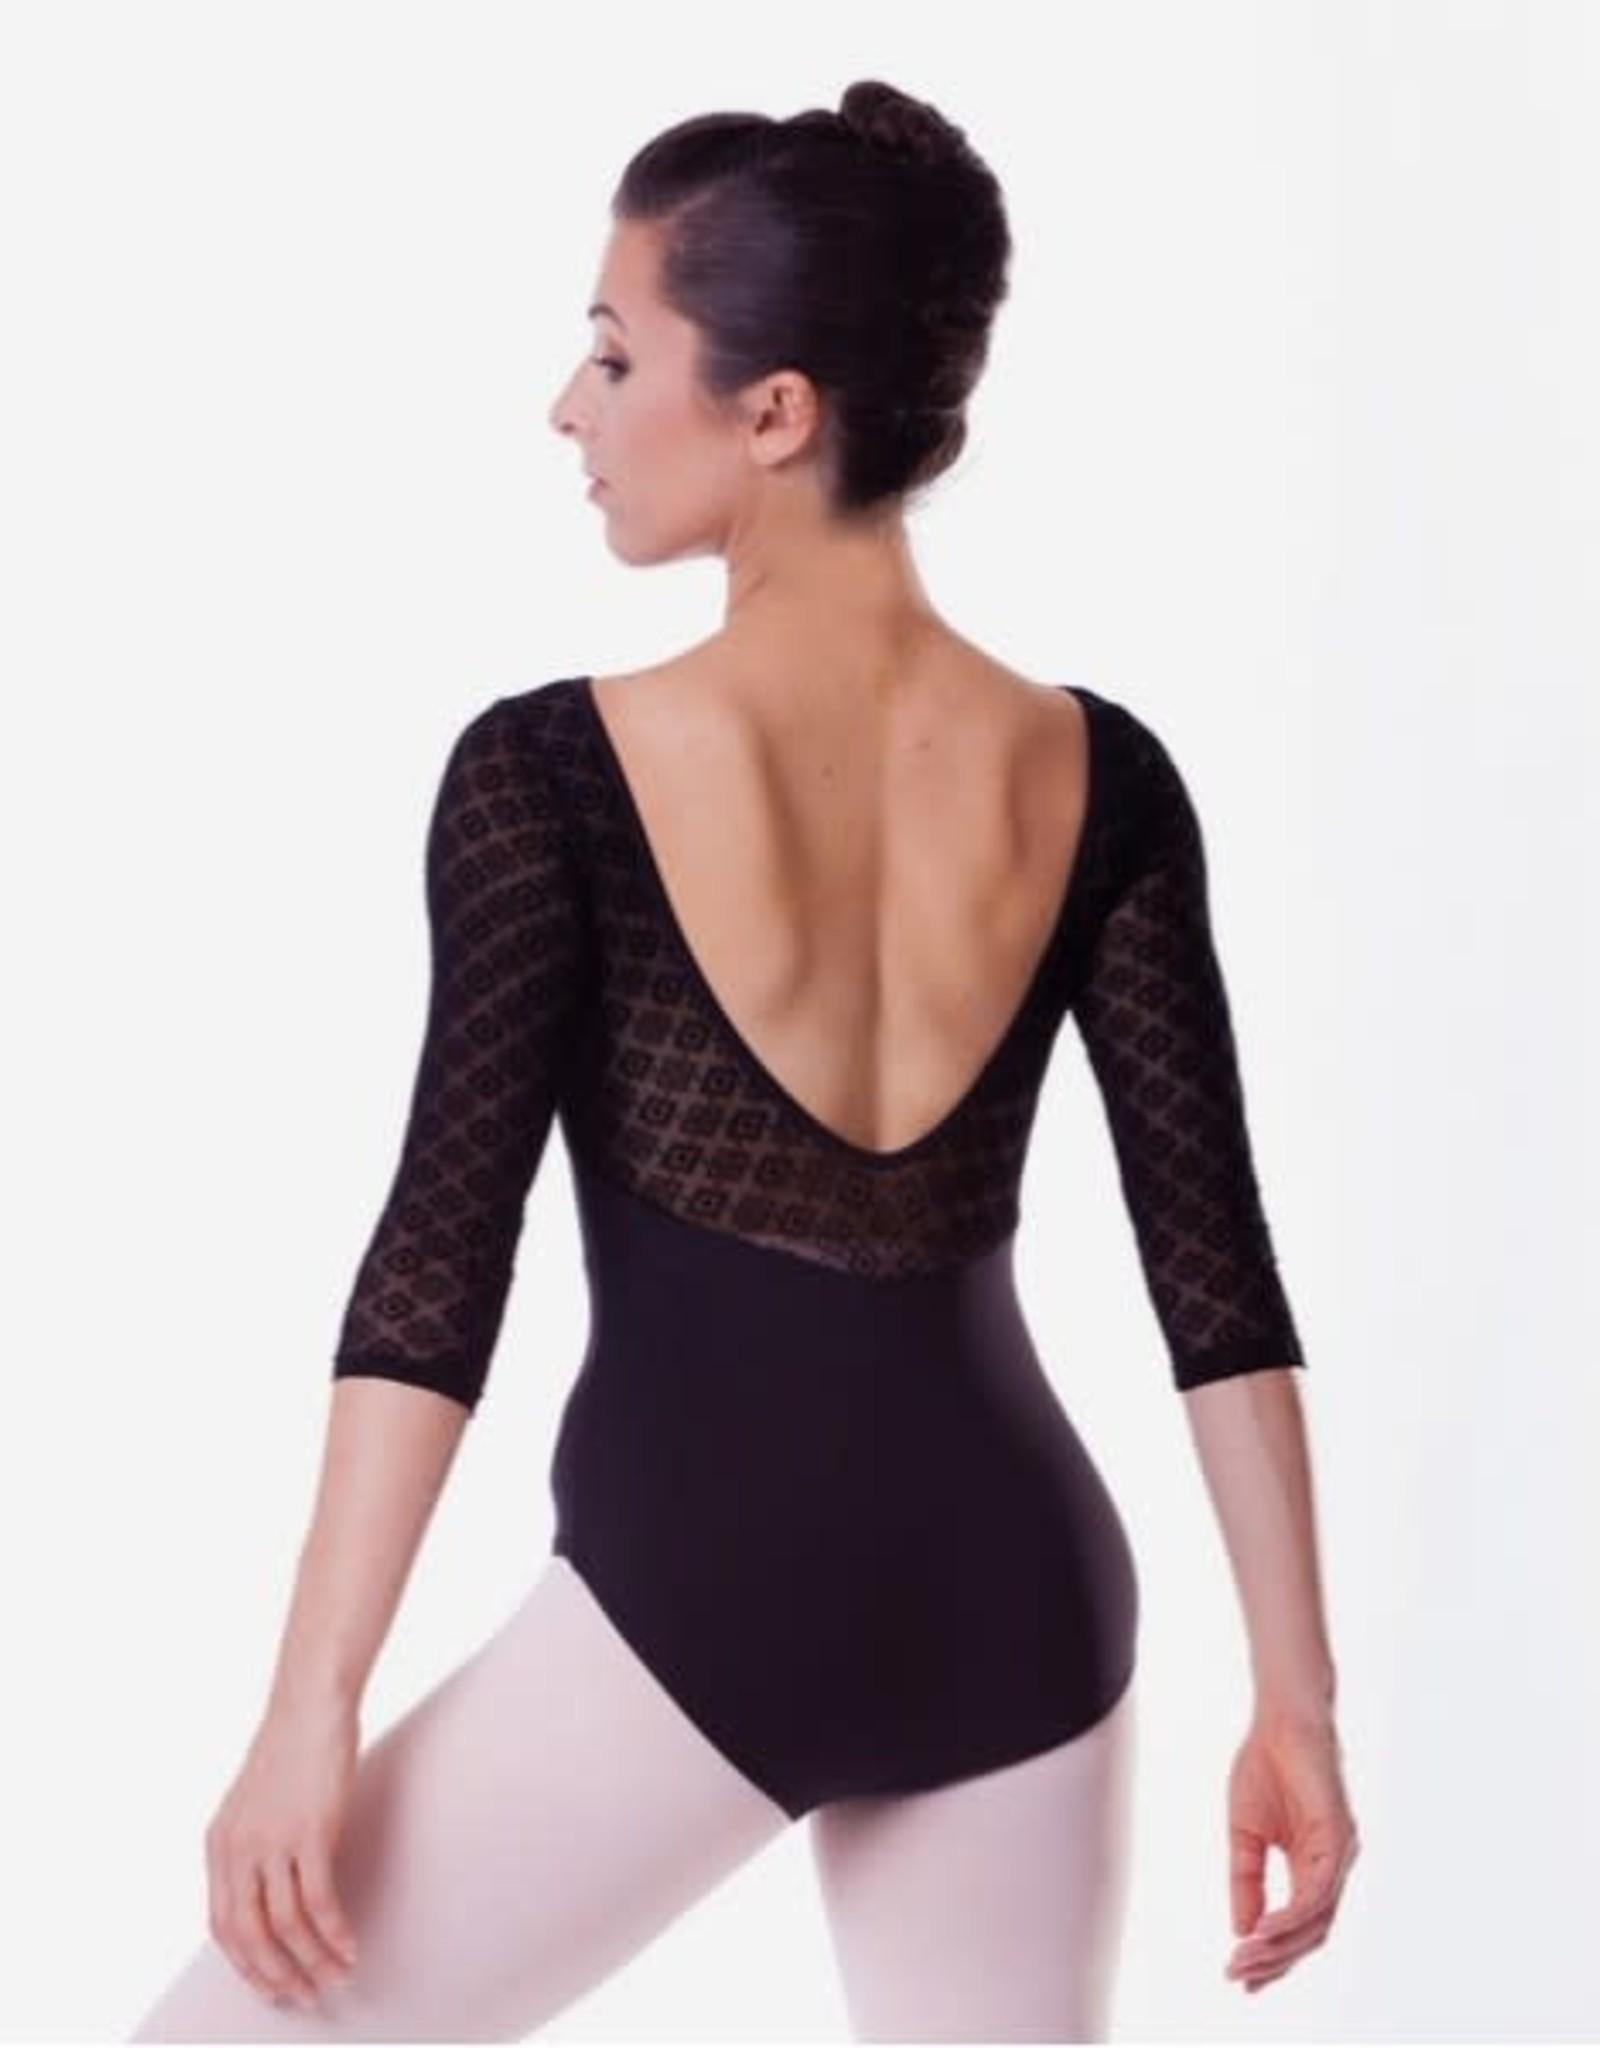 Radadancewear Sansha MAILLOT MANCHES 3/4 DENTELLE TANEY AD